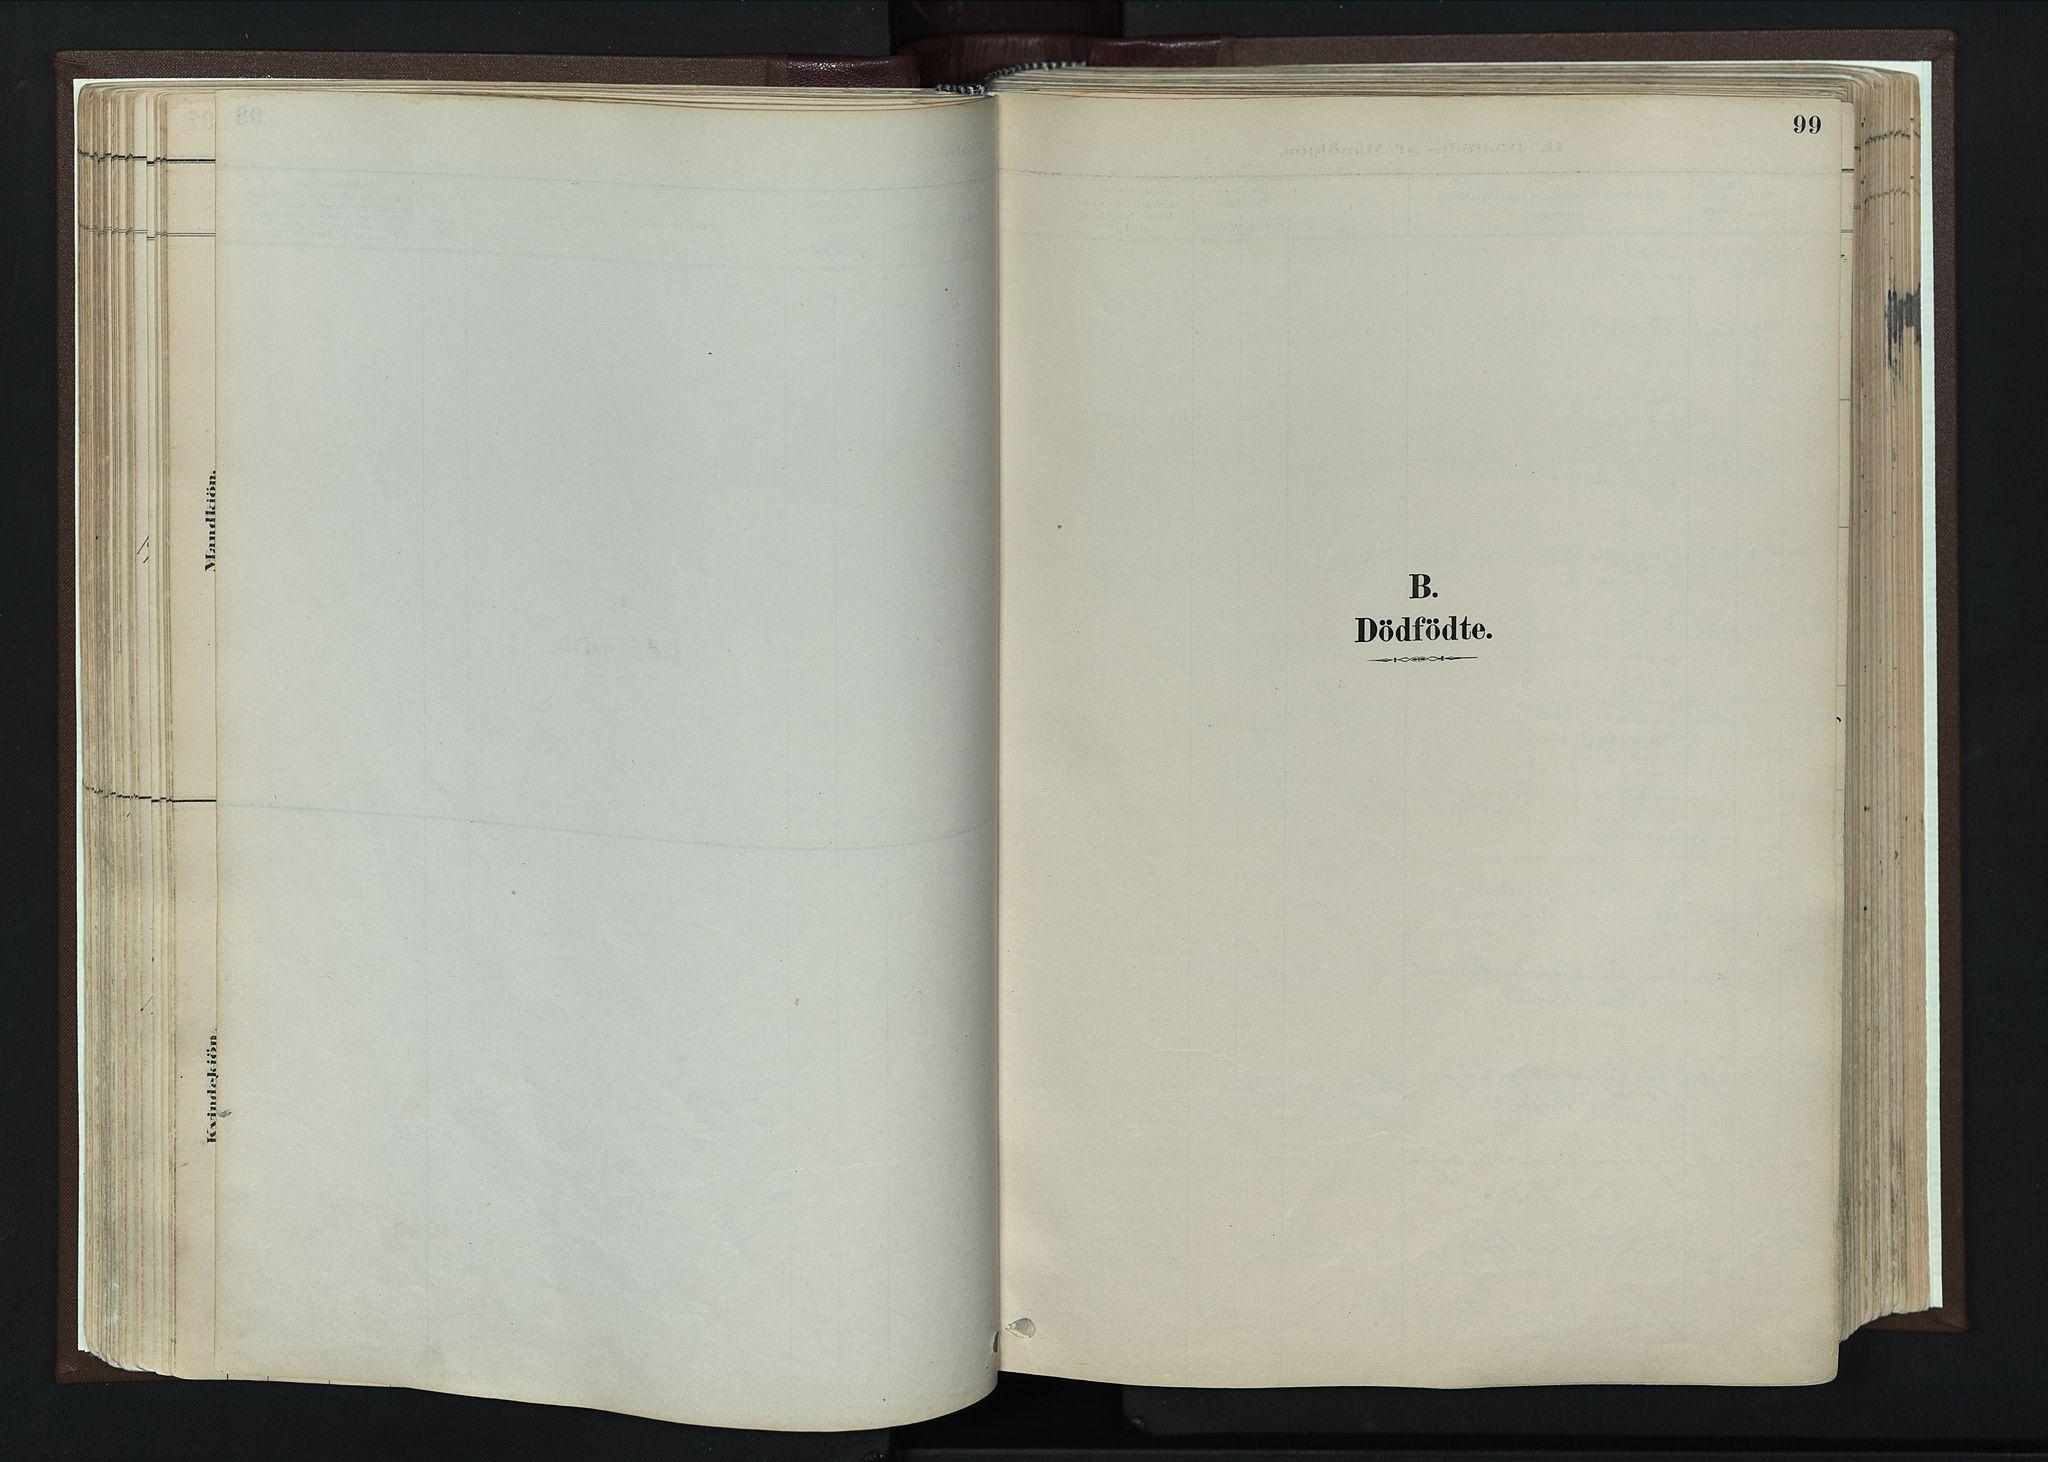 SAH, Nord-Fron prestekontor, Ministerialbok nr. 4, 1884-1914, s. 99